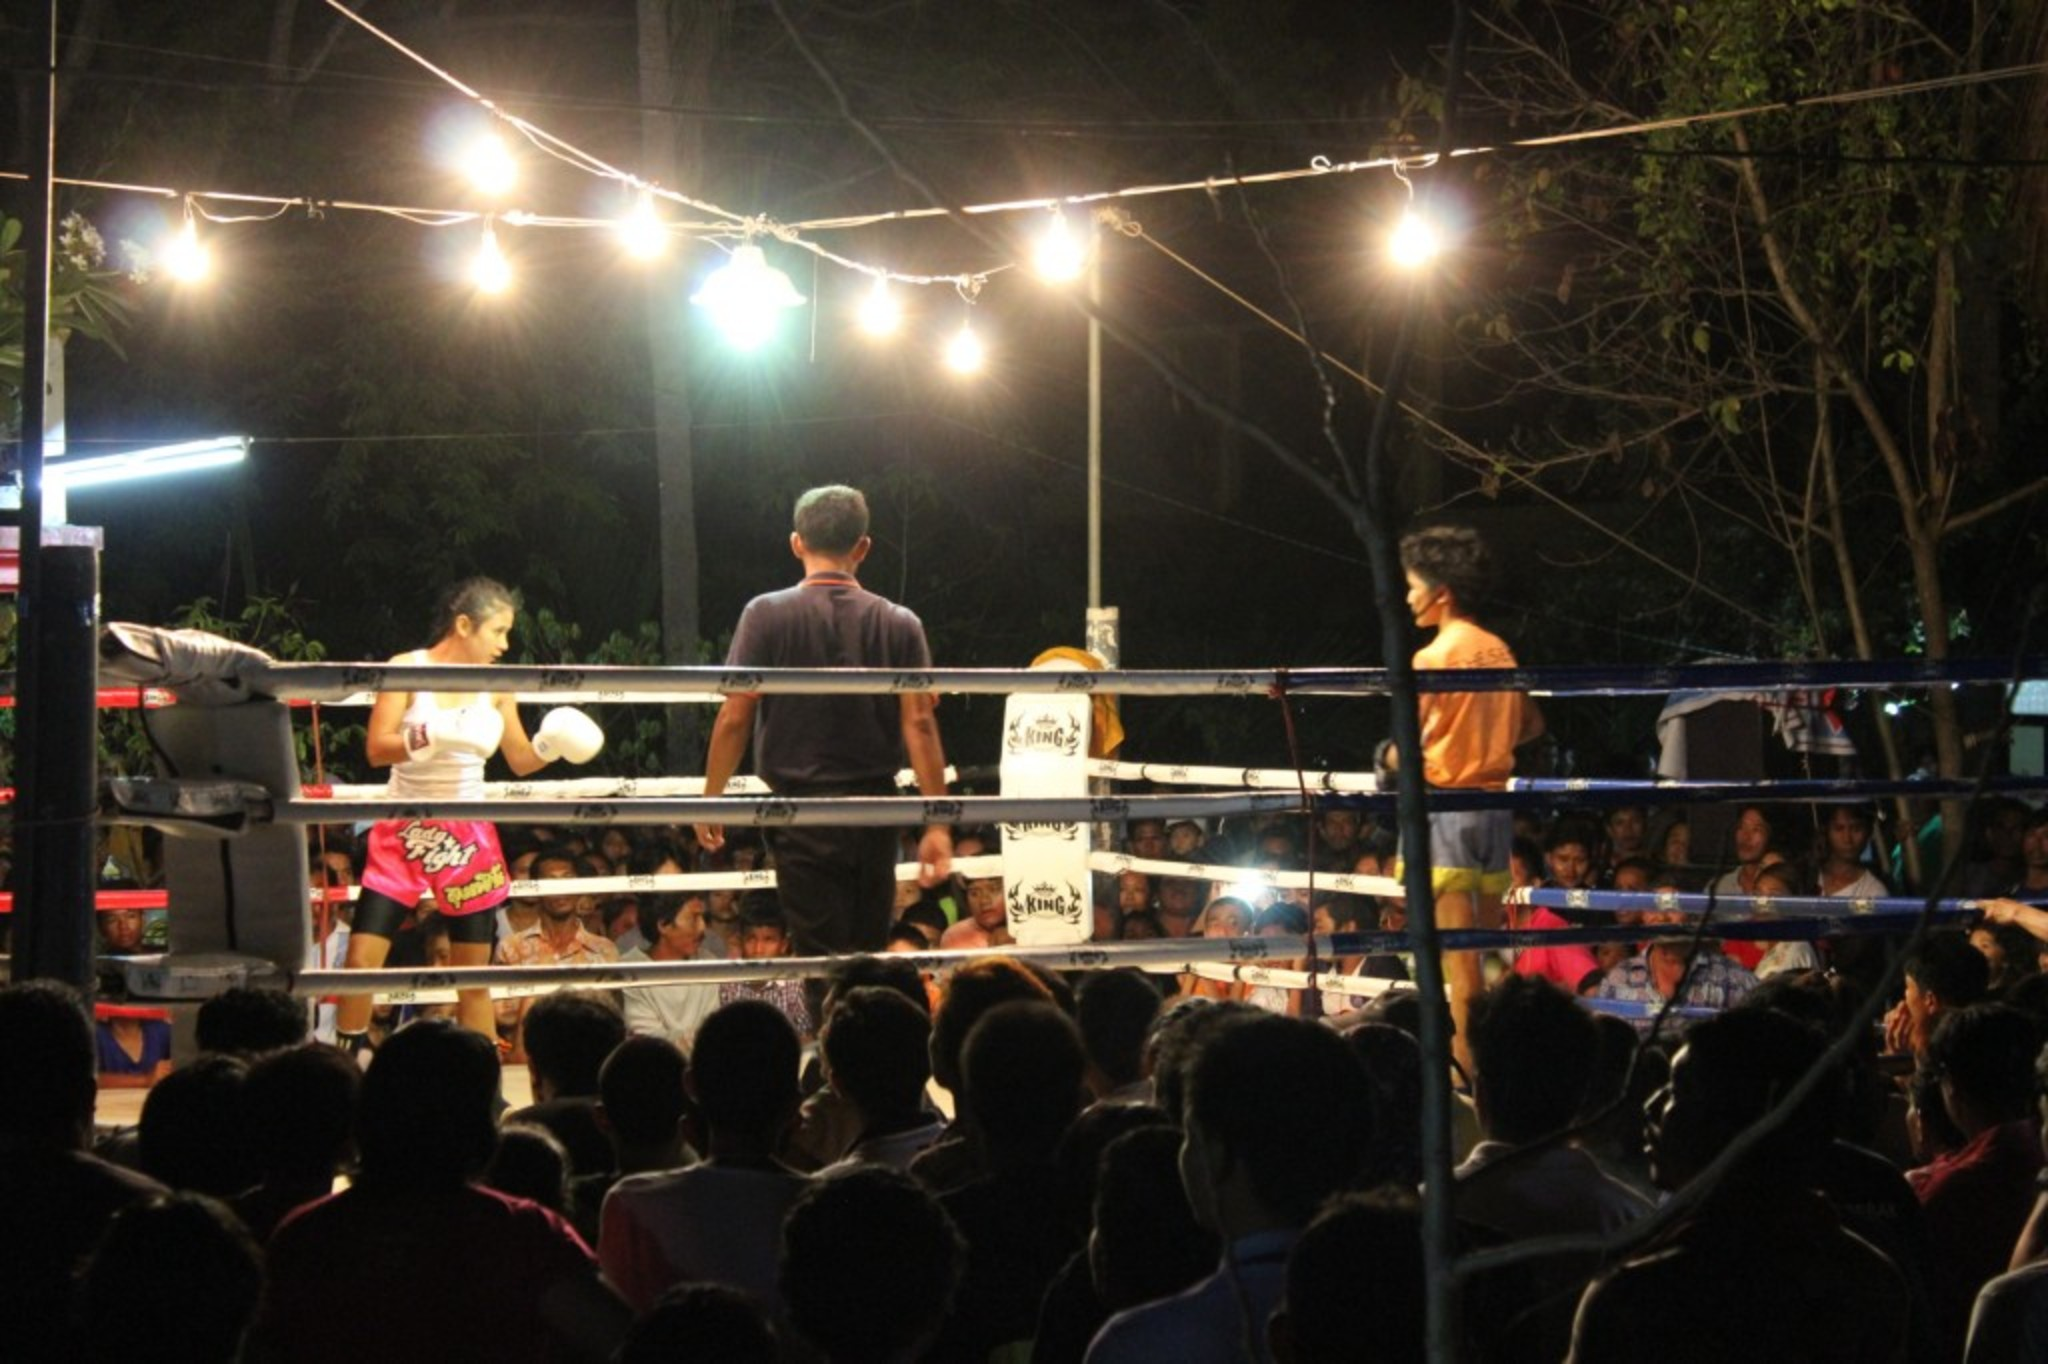 Thai - kick boxing match!